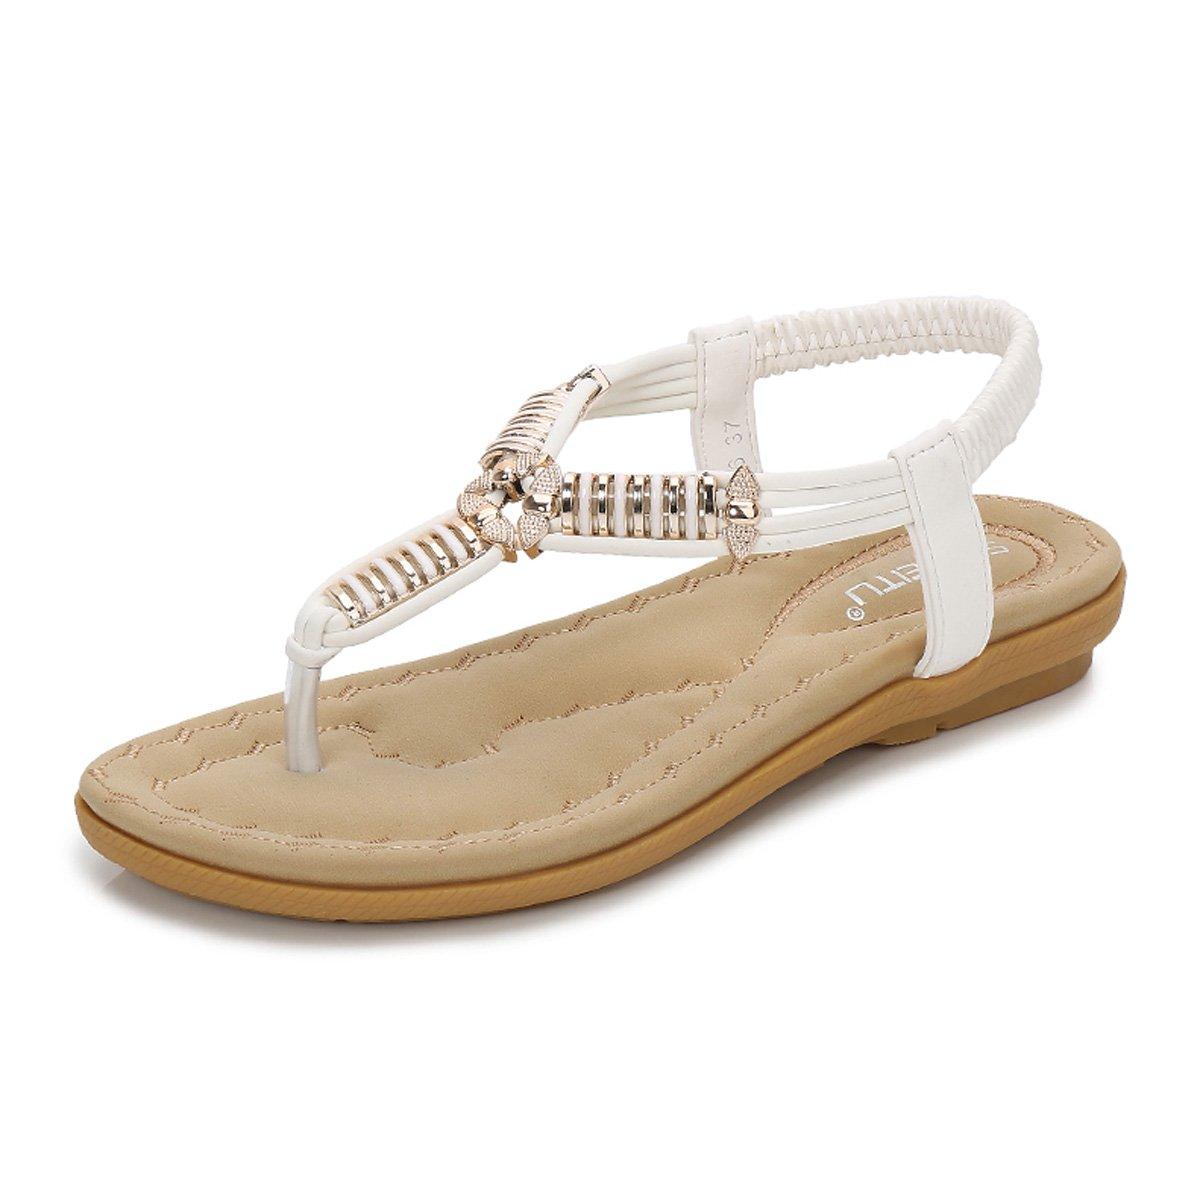 gracosy Damen Sandalen, Flip Flops Sommer Sandals Flach Zehentrenner T-Strap Offen Bouml;hmische Strand Schuhe  38 EU|Wei?